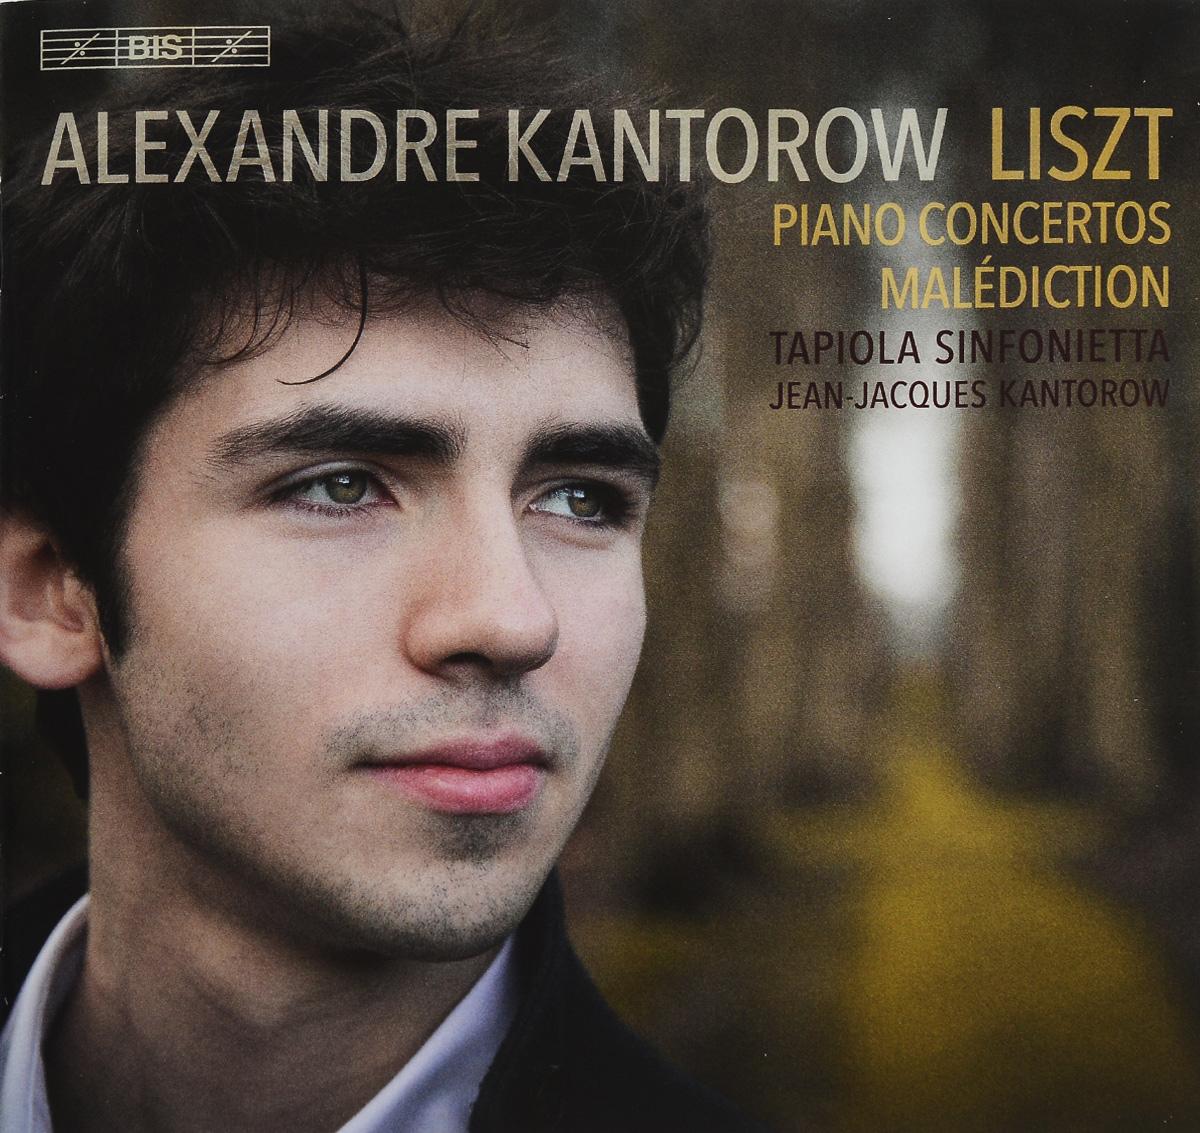 Alexandre Kantorow,Tapiola Sinfonietta,Жан-Жак Кантаров Alexandre Kantorow. Liszt. Piano Concertos. Malediction (SACD) цена